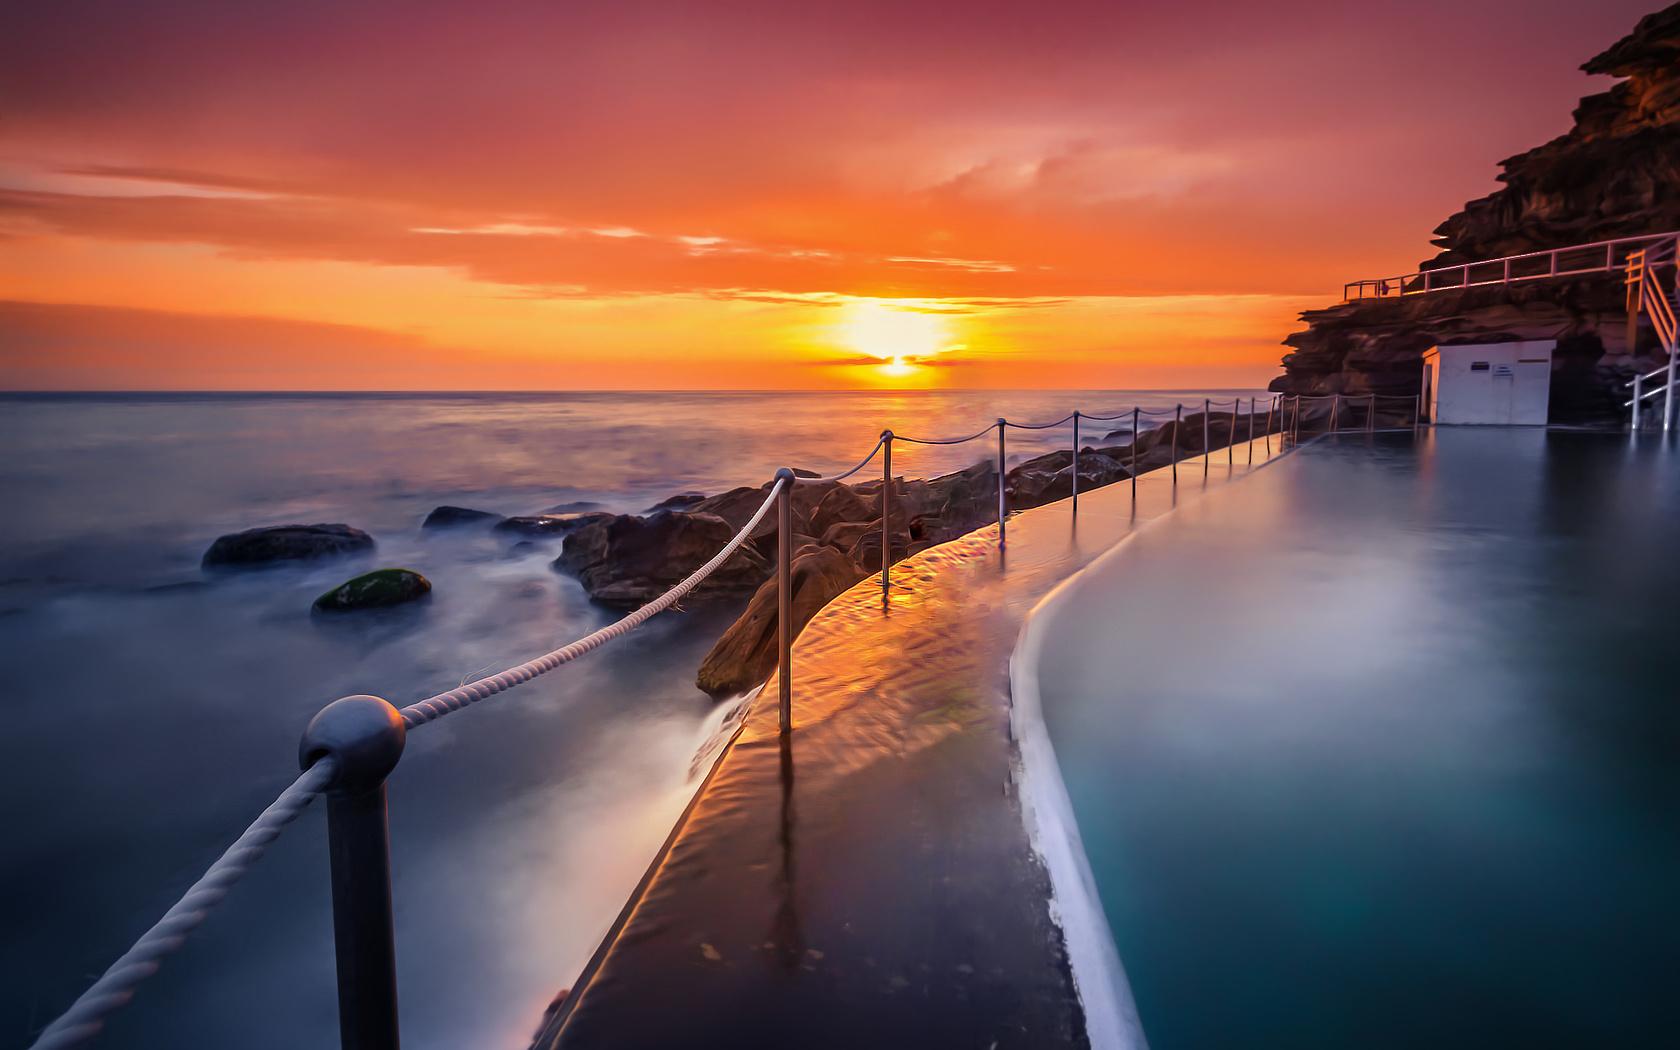 восход, бассейн, морской пейзаж, океан, небо, bronte, derek zhang